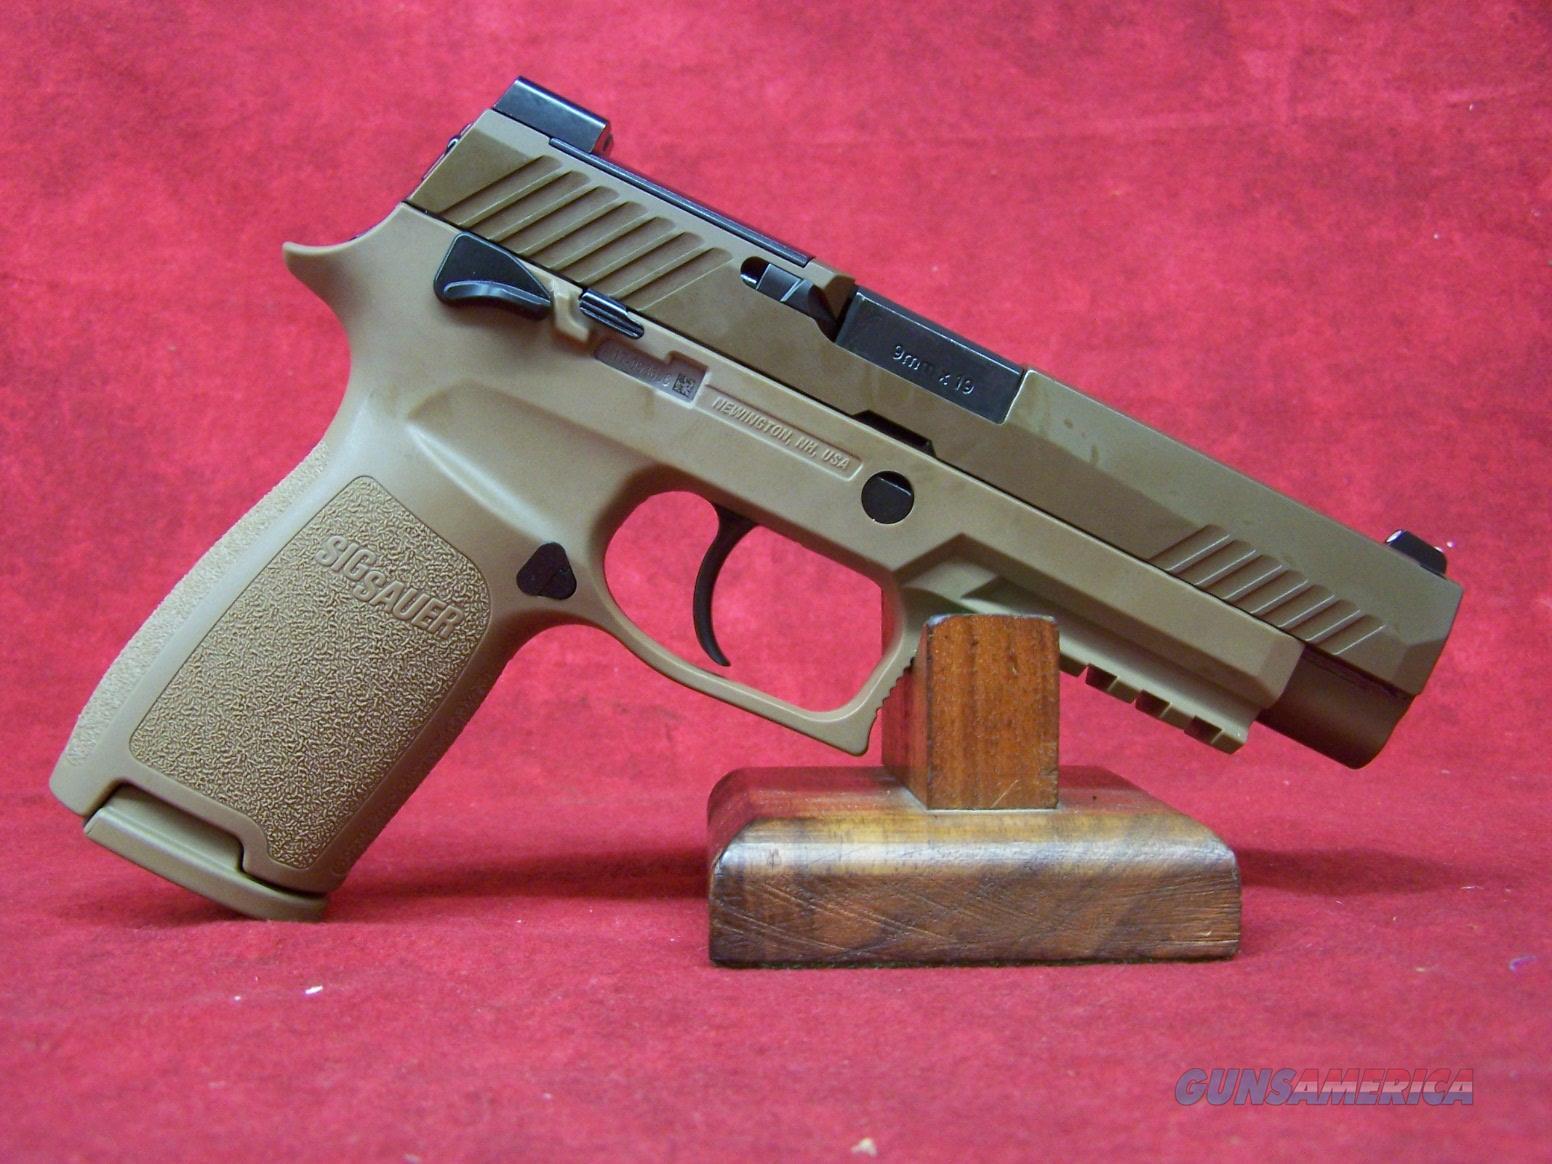 "Sig Sauer P320 M17 Coyote PVD 9mm Luger 4.7"" Barrel (320F-9-M17-MS)  Guns > Pistols > Sig - Sauer/Sigarms Pistols > P320"